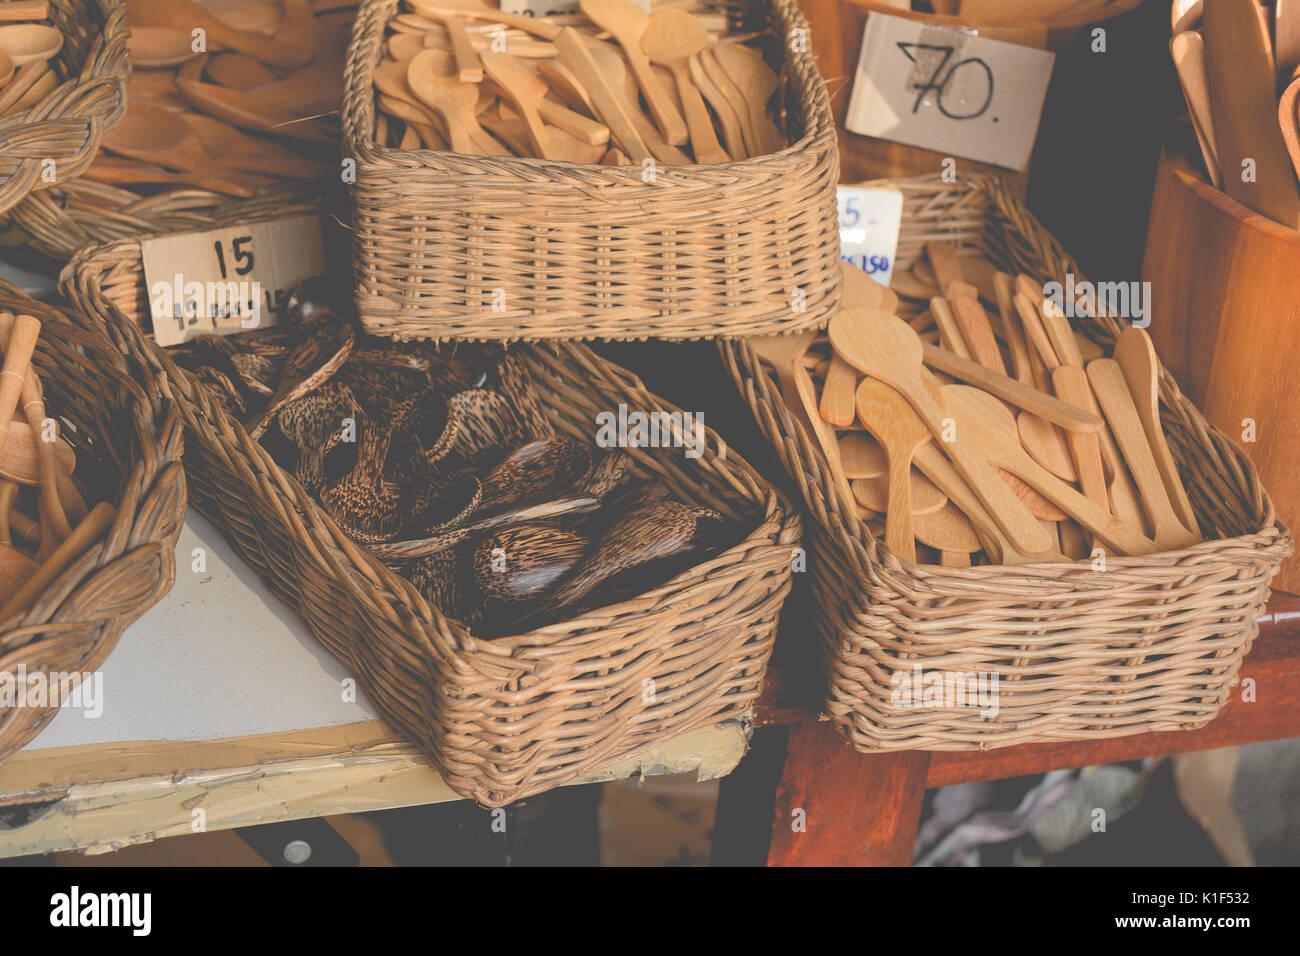 Retro Effect Faded Image Of Wooden Kitchenware Handicrafts Vintage